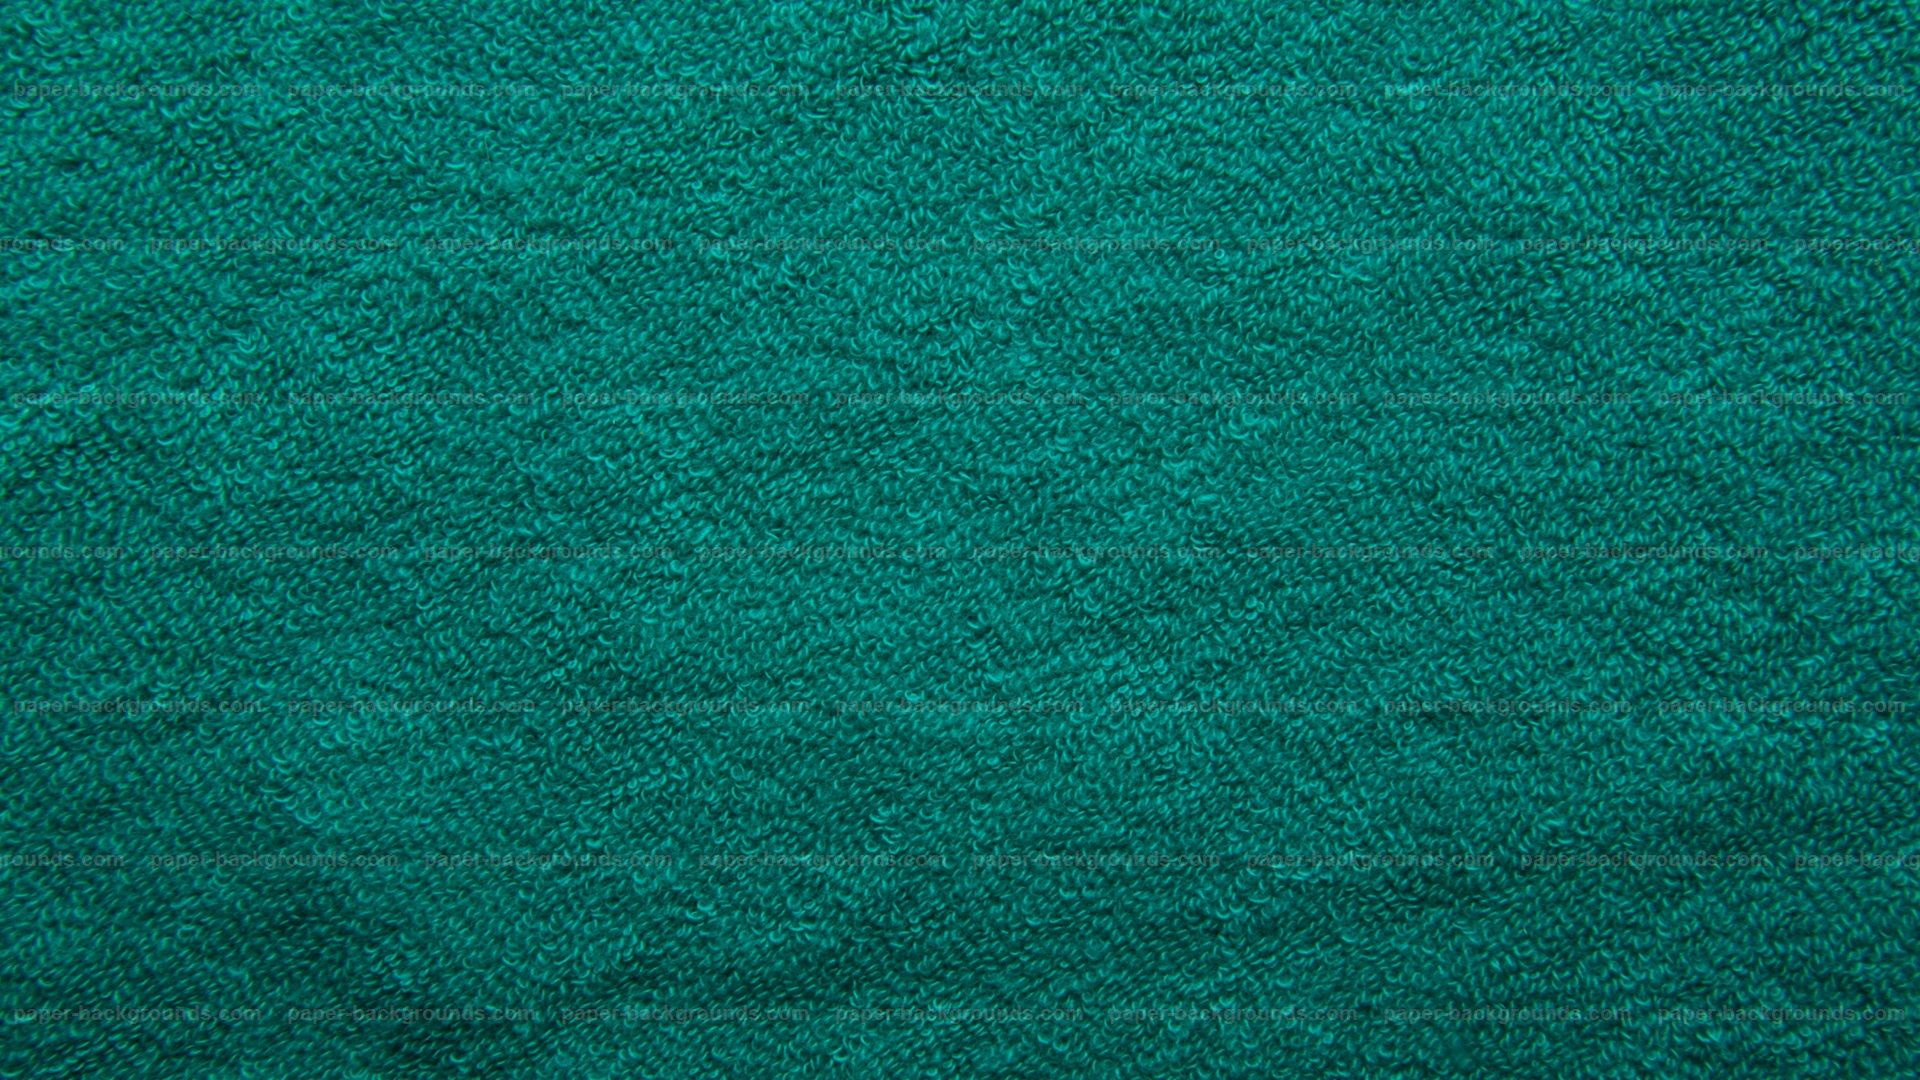 green-soft-fabric-texture-hd-paper-backgrounds.jpg (1920×1080 ... for Fabric Texture Pattern Hd  35fsj